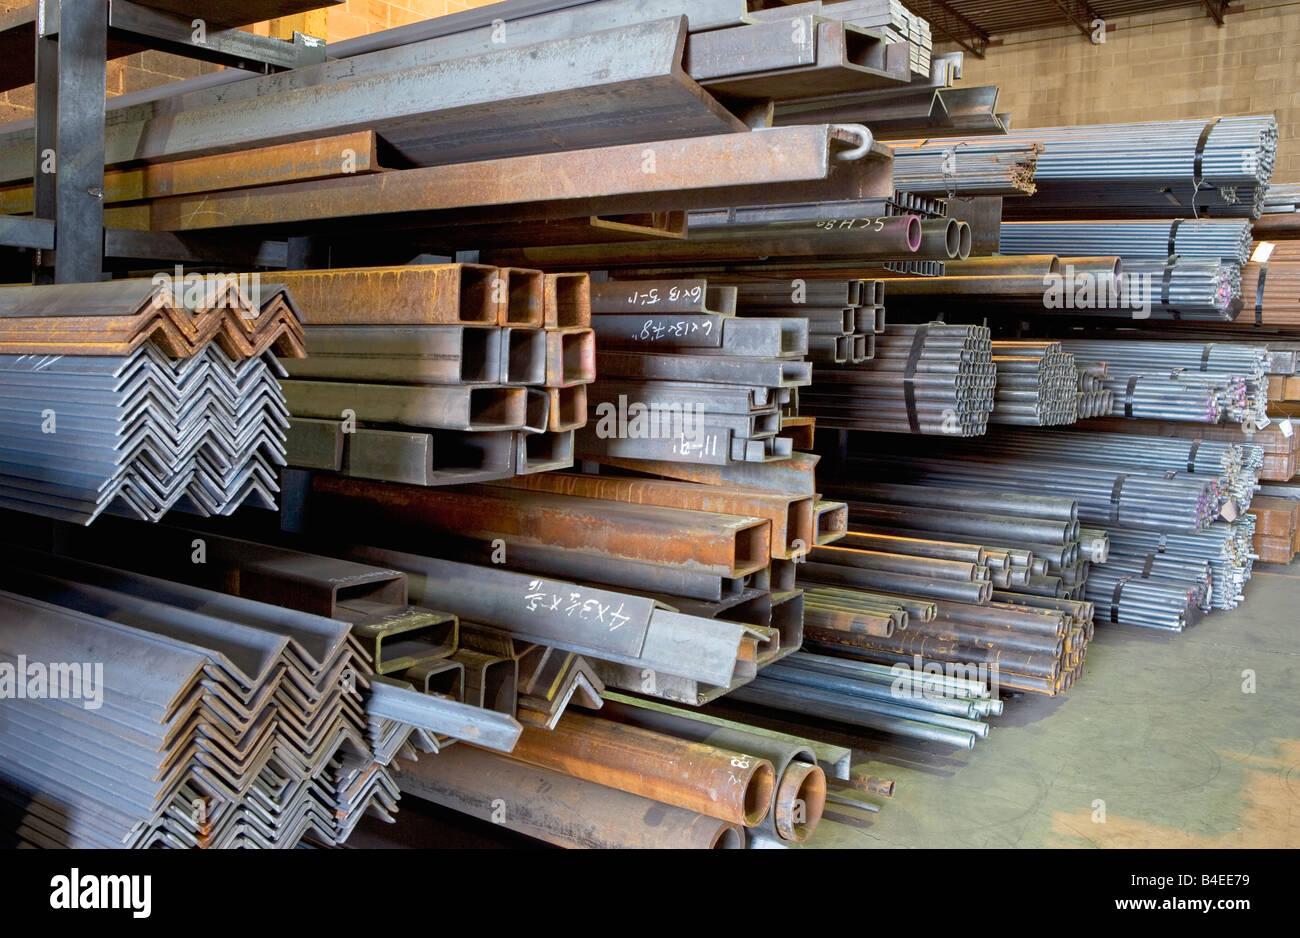 Iron Beams Beam Rust Metal Steel Rusty Angle